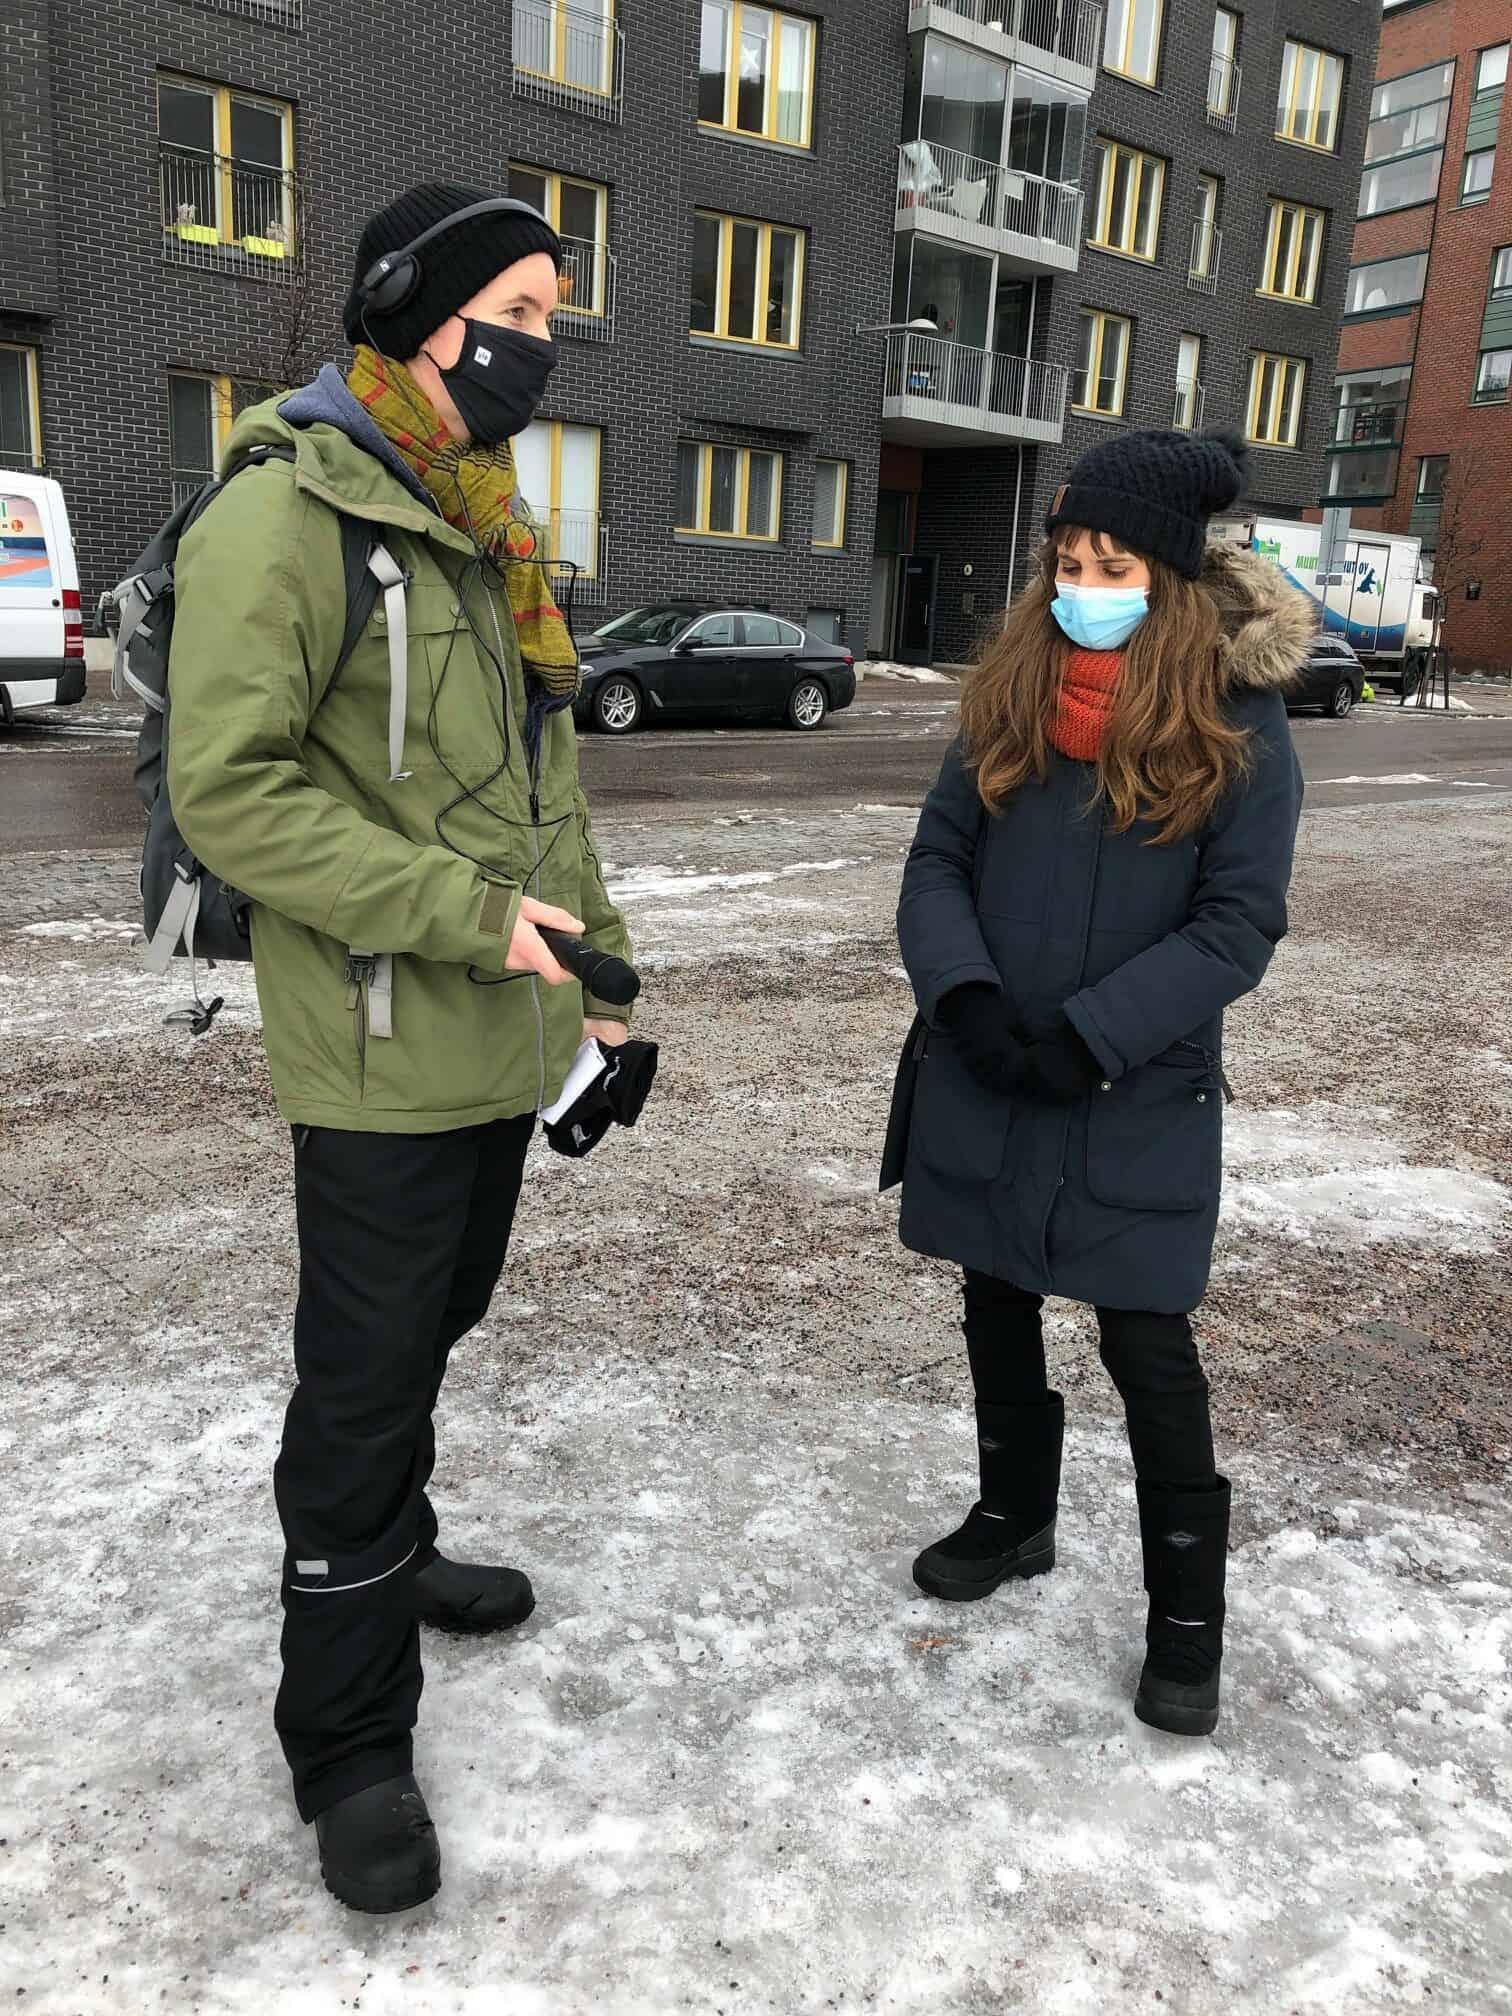 Vesa Marttinen interviews Silviya Korpilo